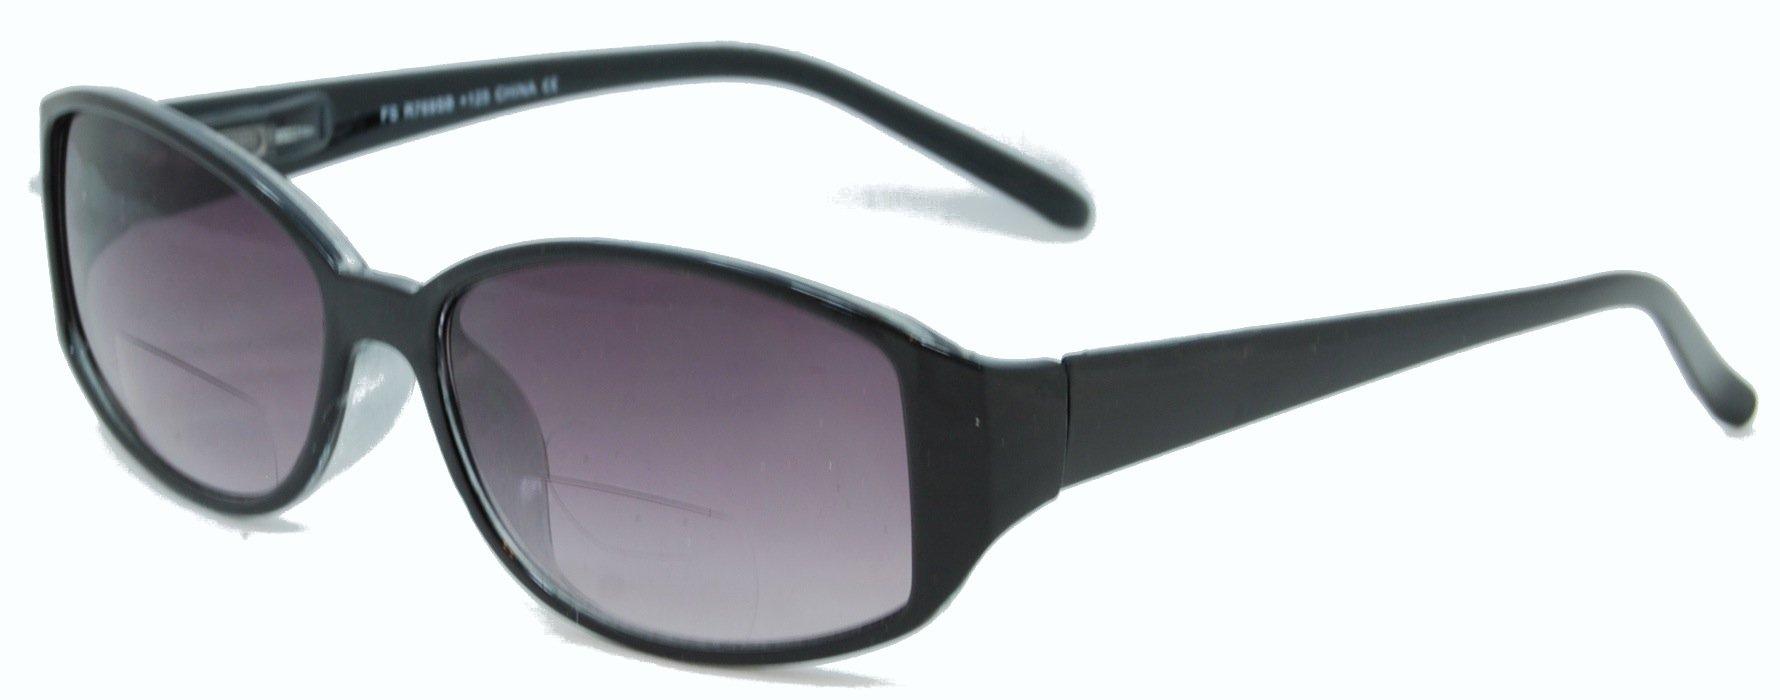 In Style Eyes Stylish Bifocal Sunglasses Black 2.50